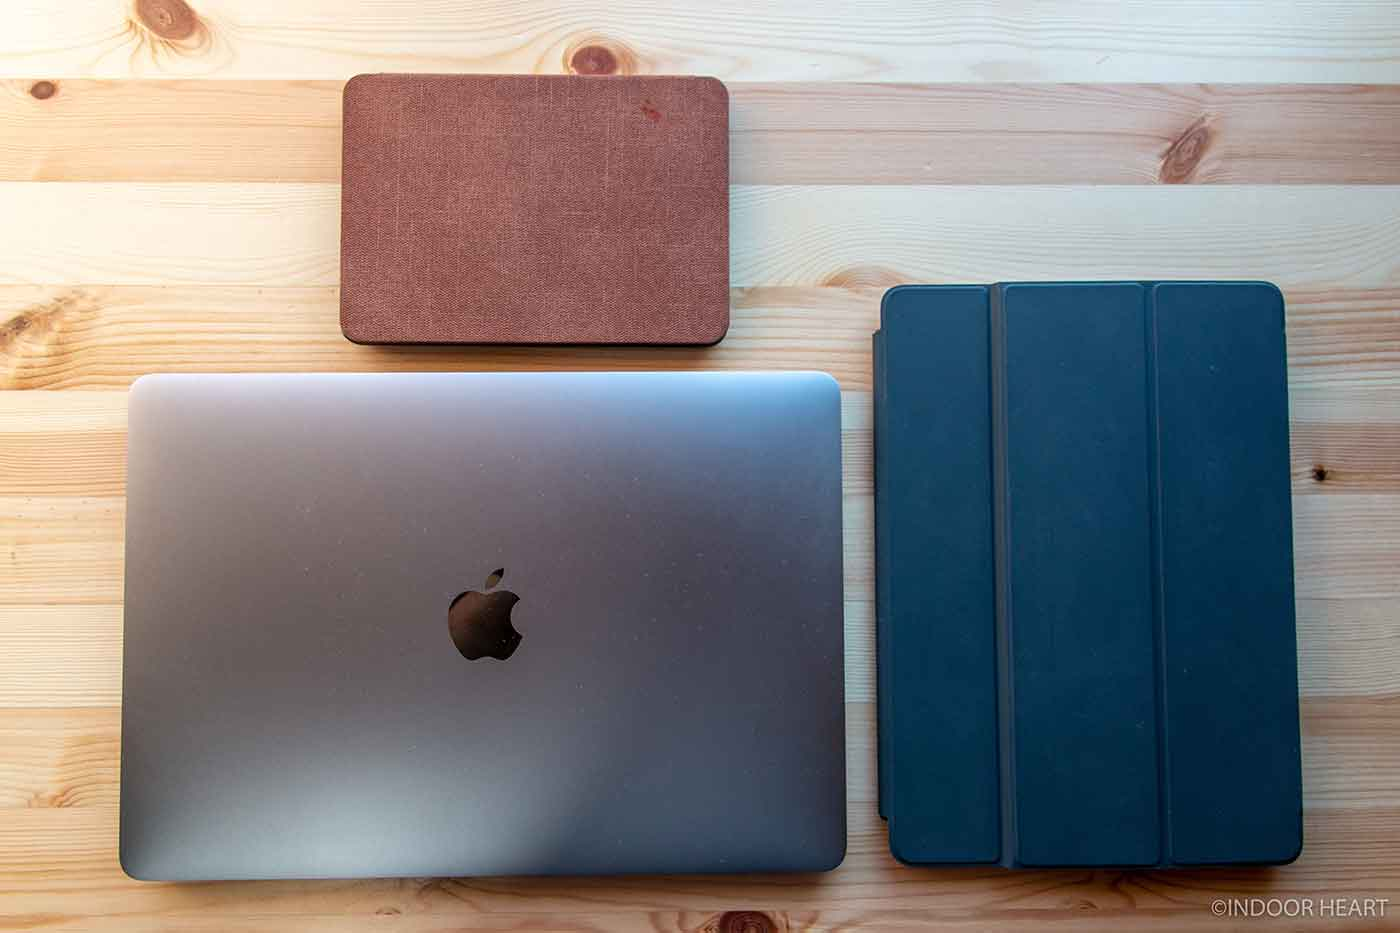 MacBookとiPadとKindle Paperwhite